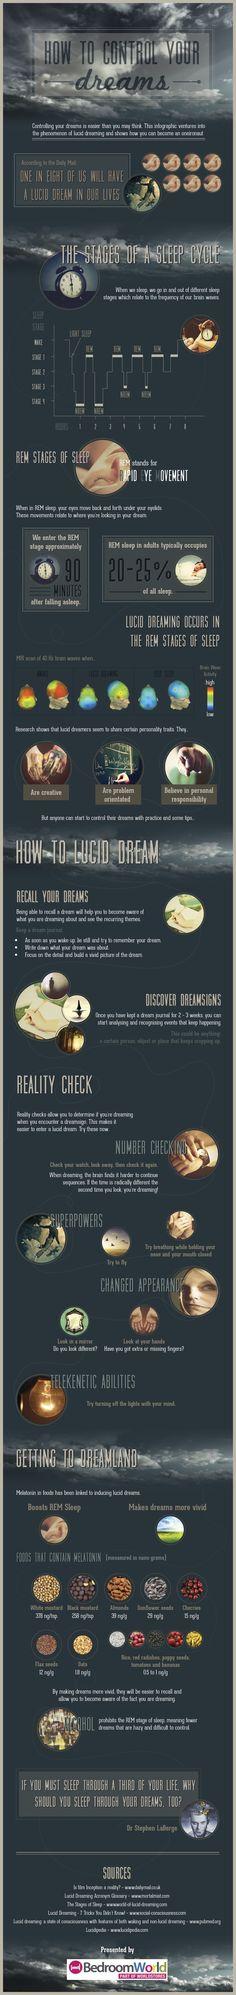 How to Control Your Dreams | Rüyalarınızı Nasıl Kontrol Edebilirsiniz? control, stuff, dreams, interest, random, infograph, health, thing, lucid dream